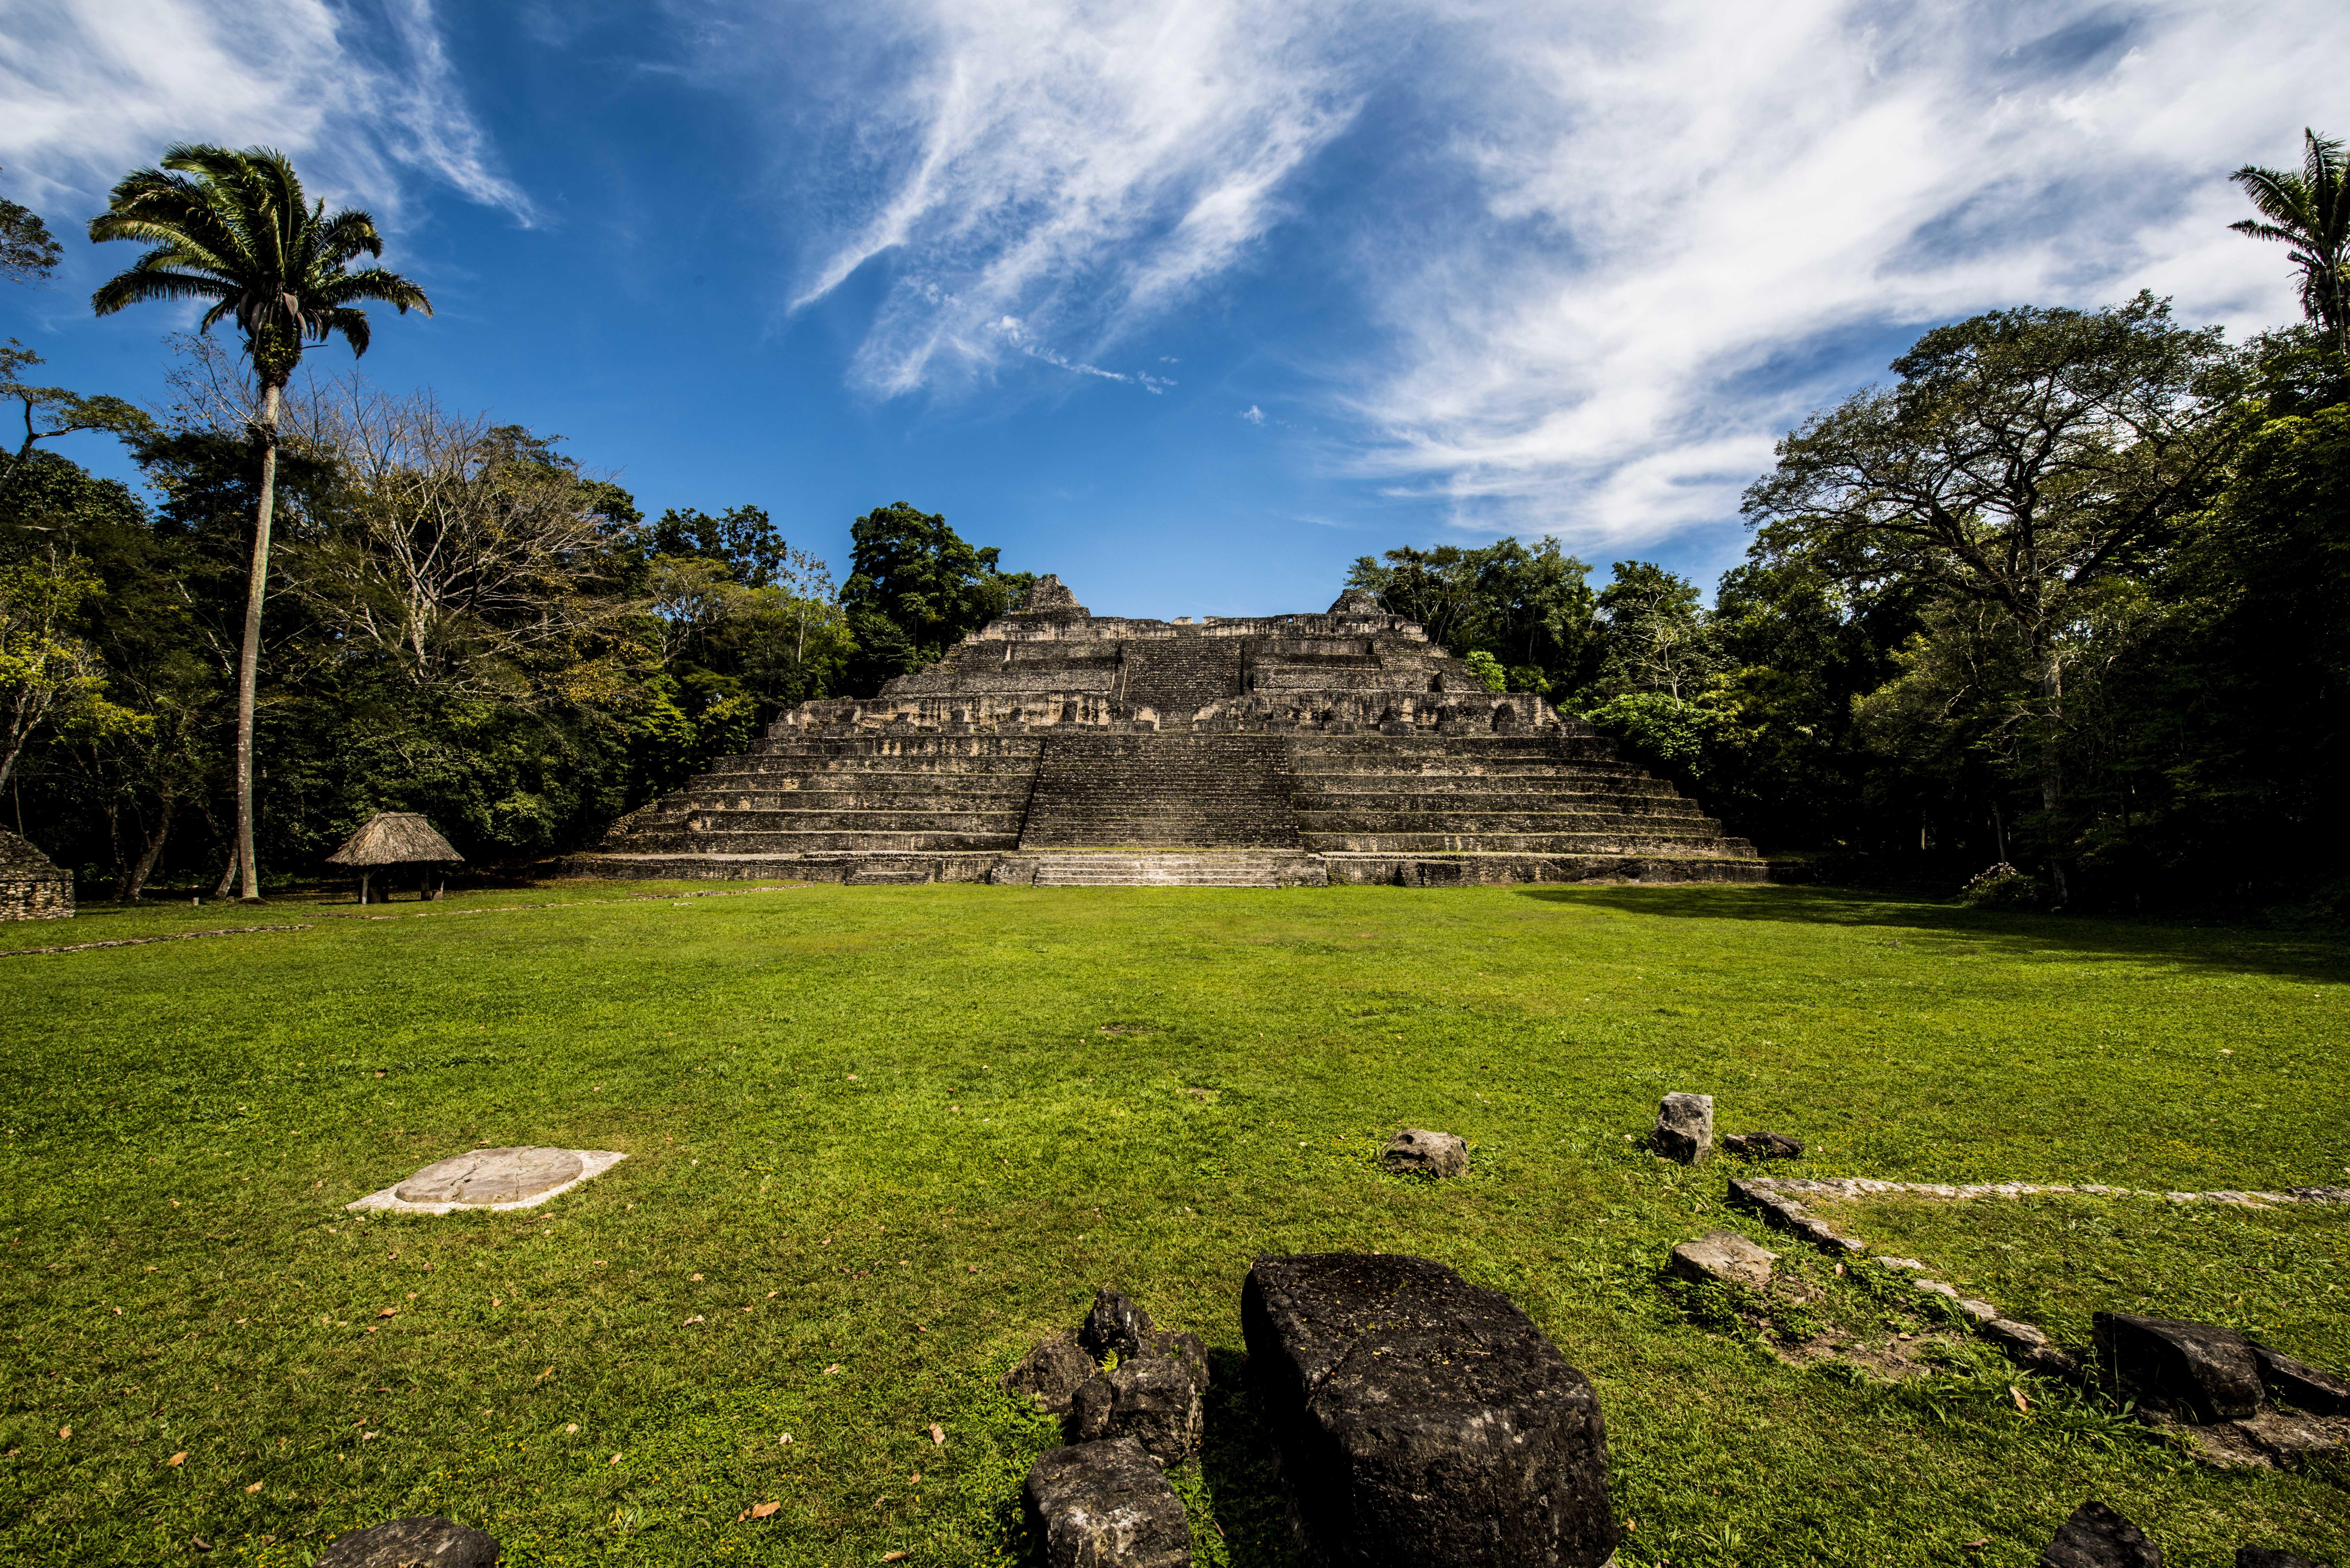 Caracol Mayan Site